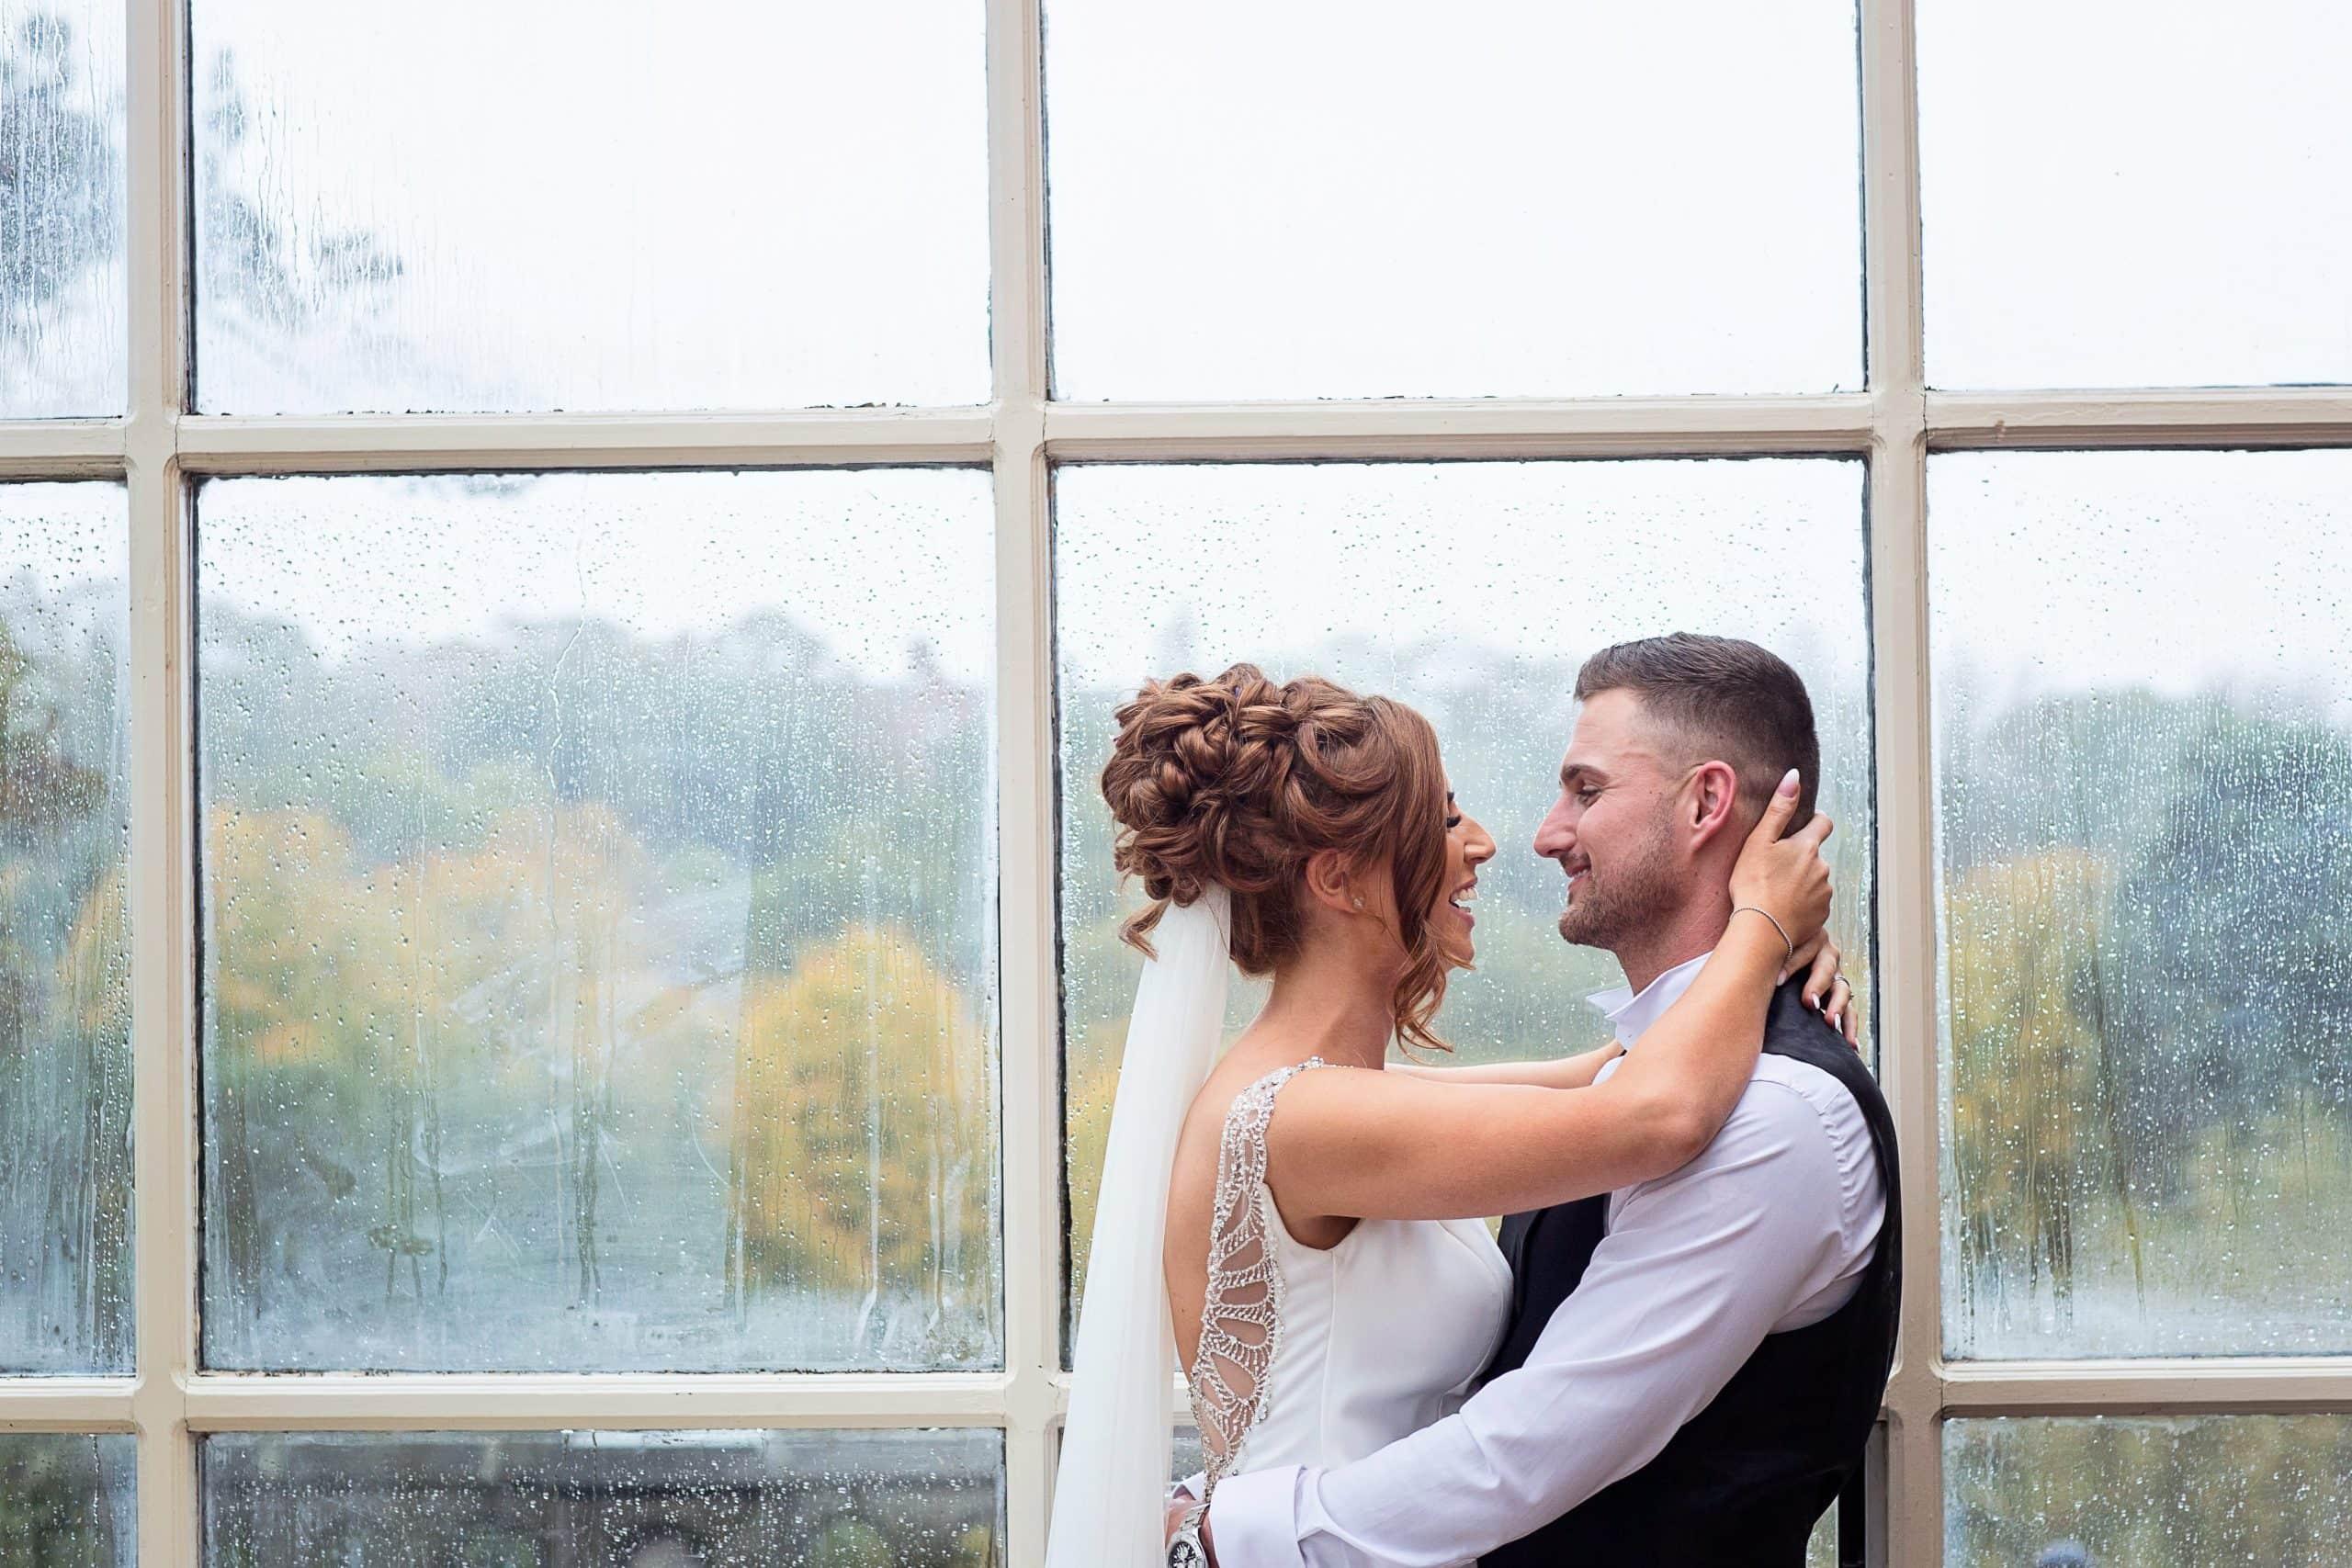 Rushpool Hall Wedding Photo